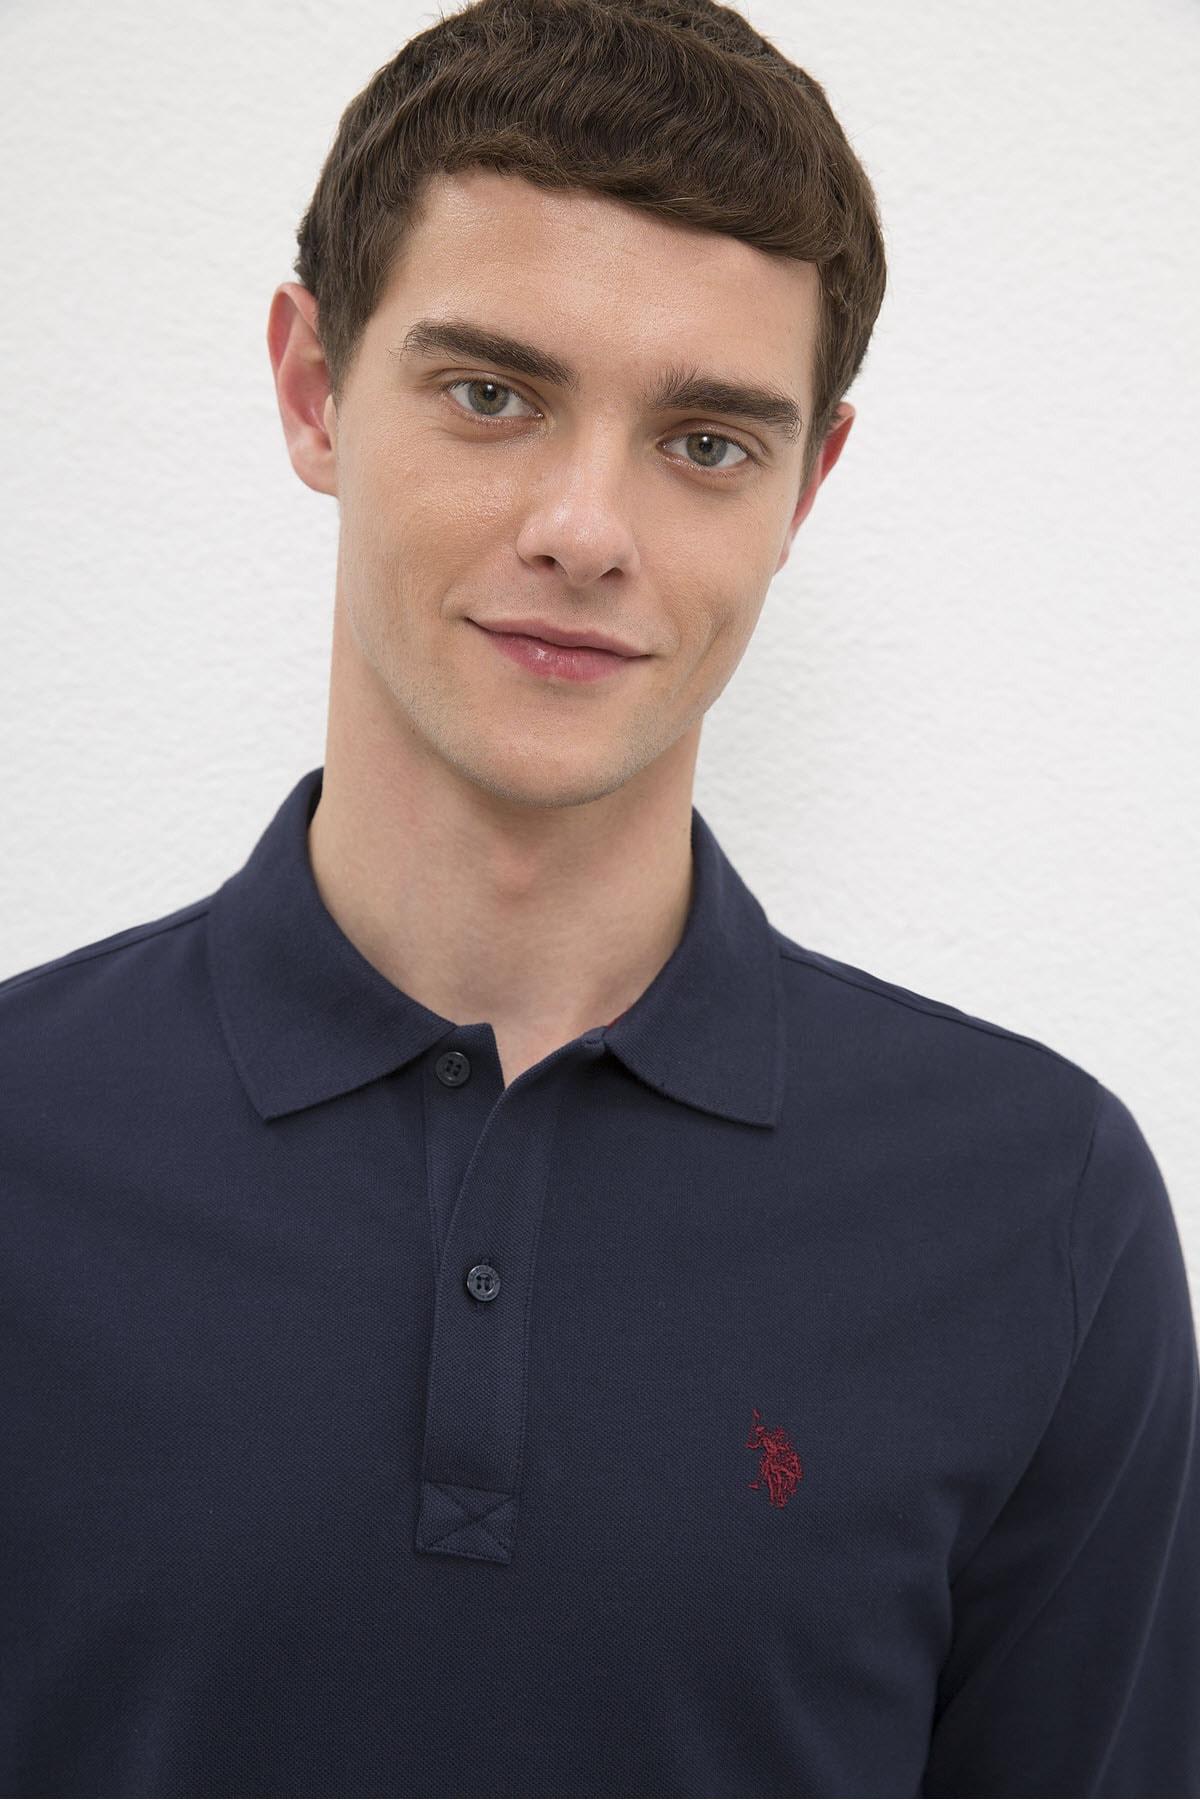 U.S. Polo Assn. Lacıvert Erkek Sweatshirt 2